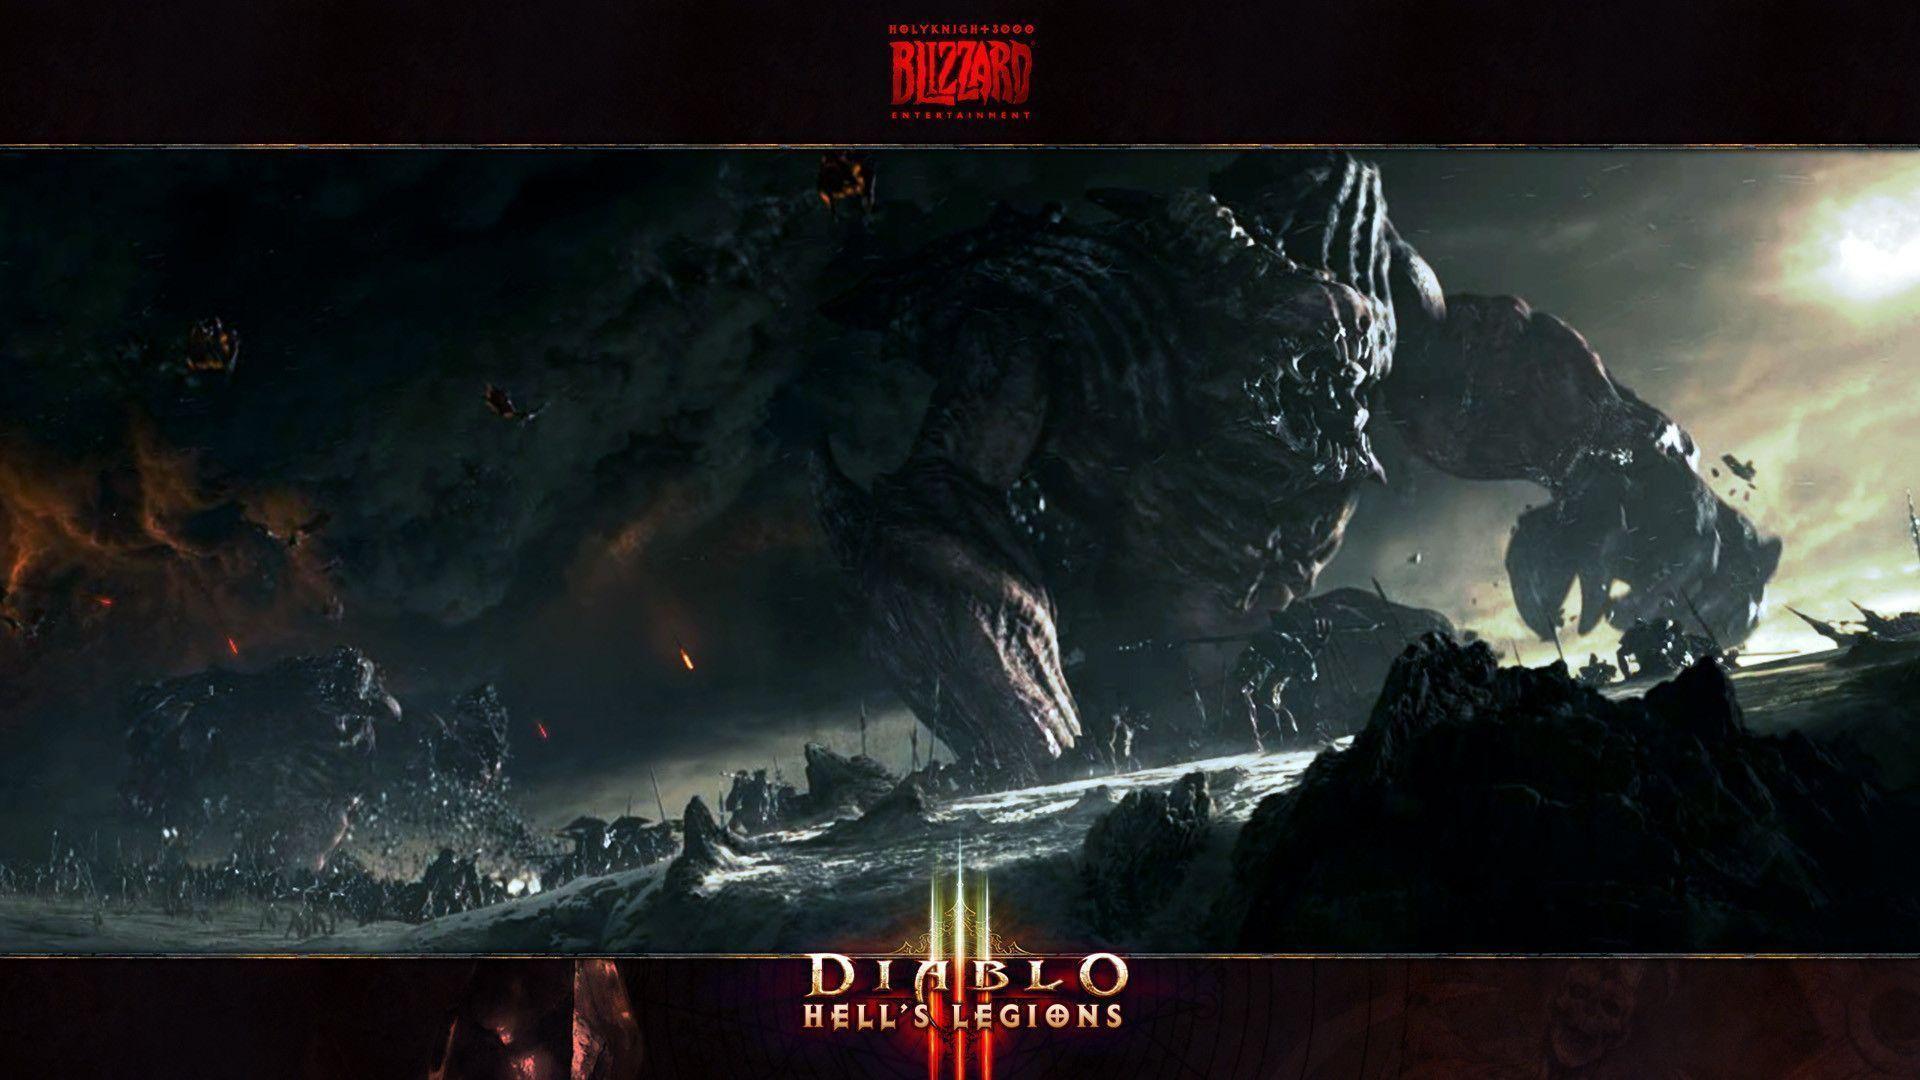 Diablo 3 Wallpaper 1920x1080: Diablo 3 Wallpapers 1920x1080